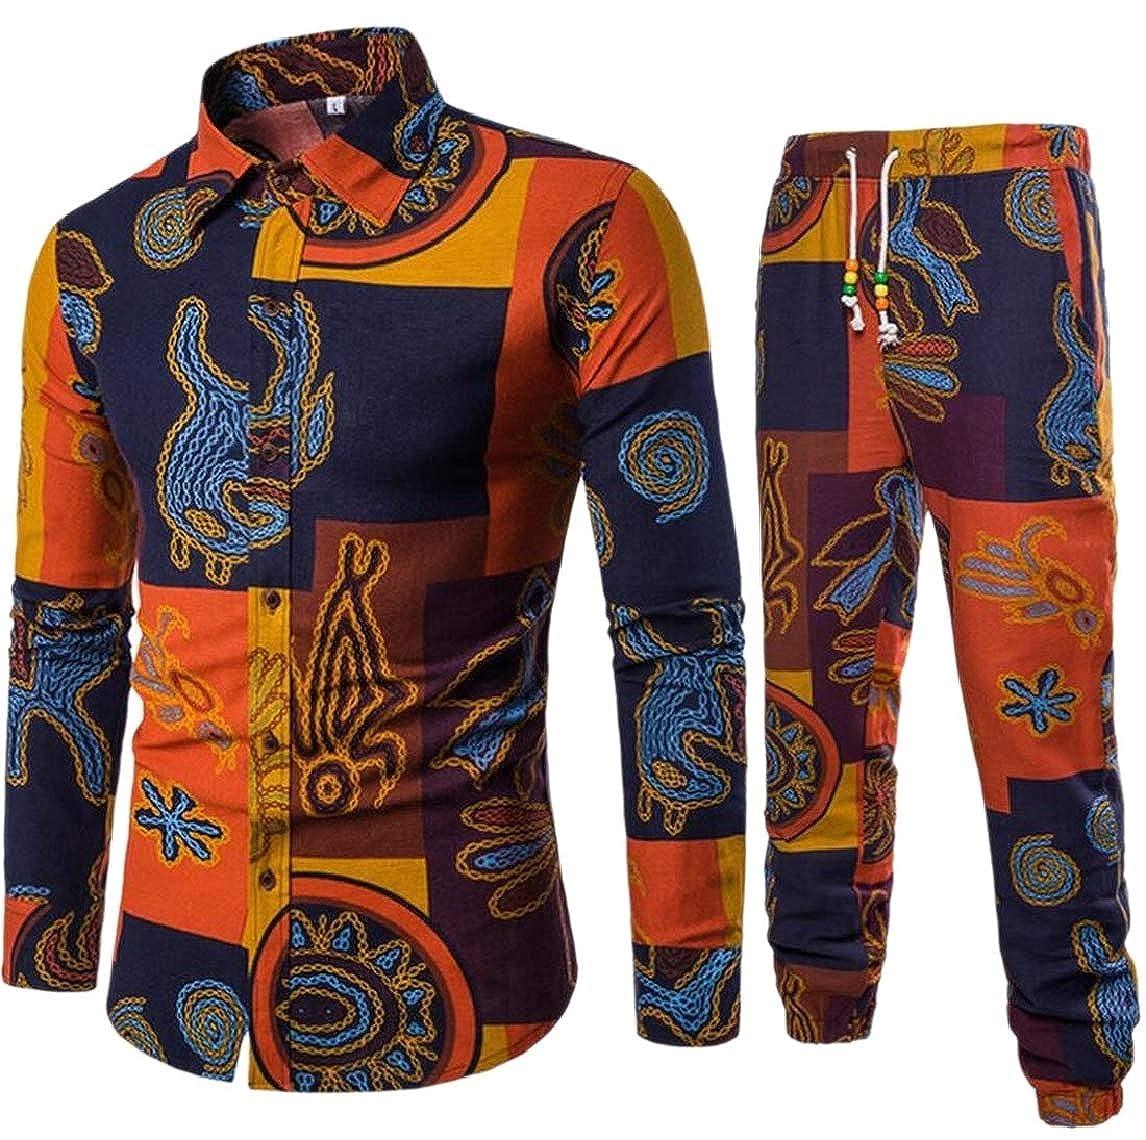 LKCEN-CA Men's Fashion Dashiki Print African Linen Cotton + Top Short Two Piece